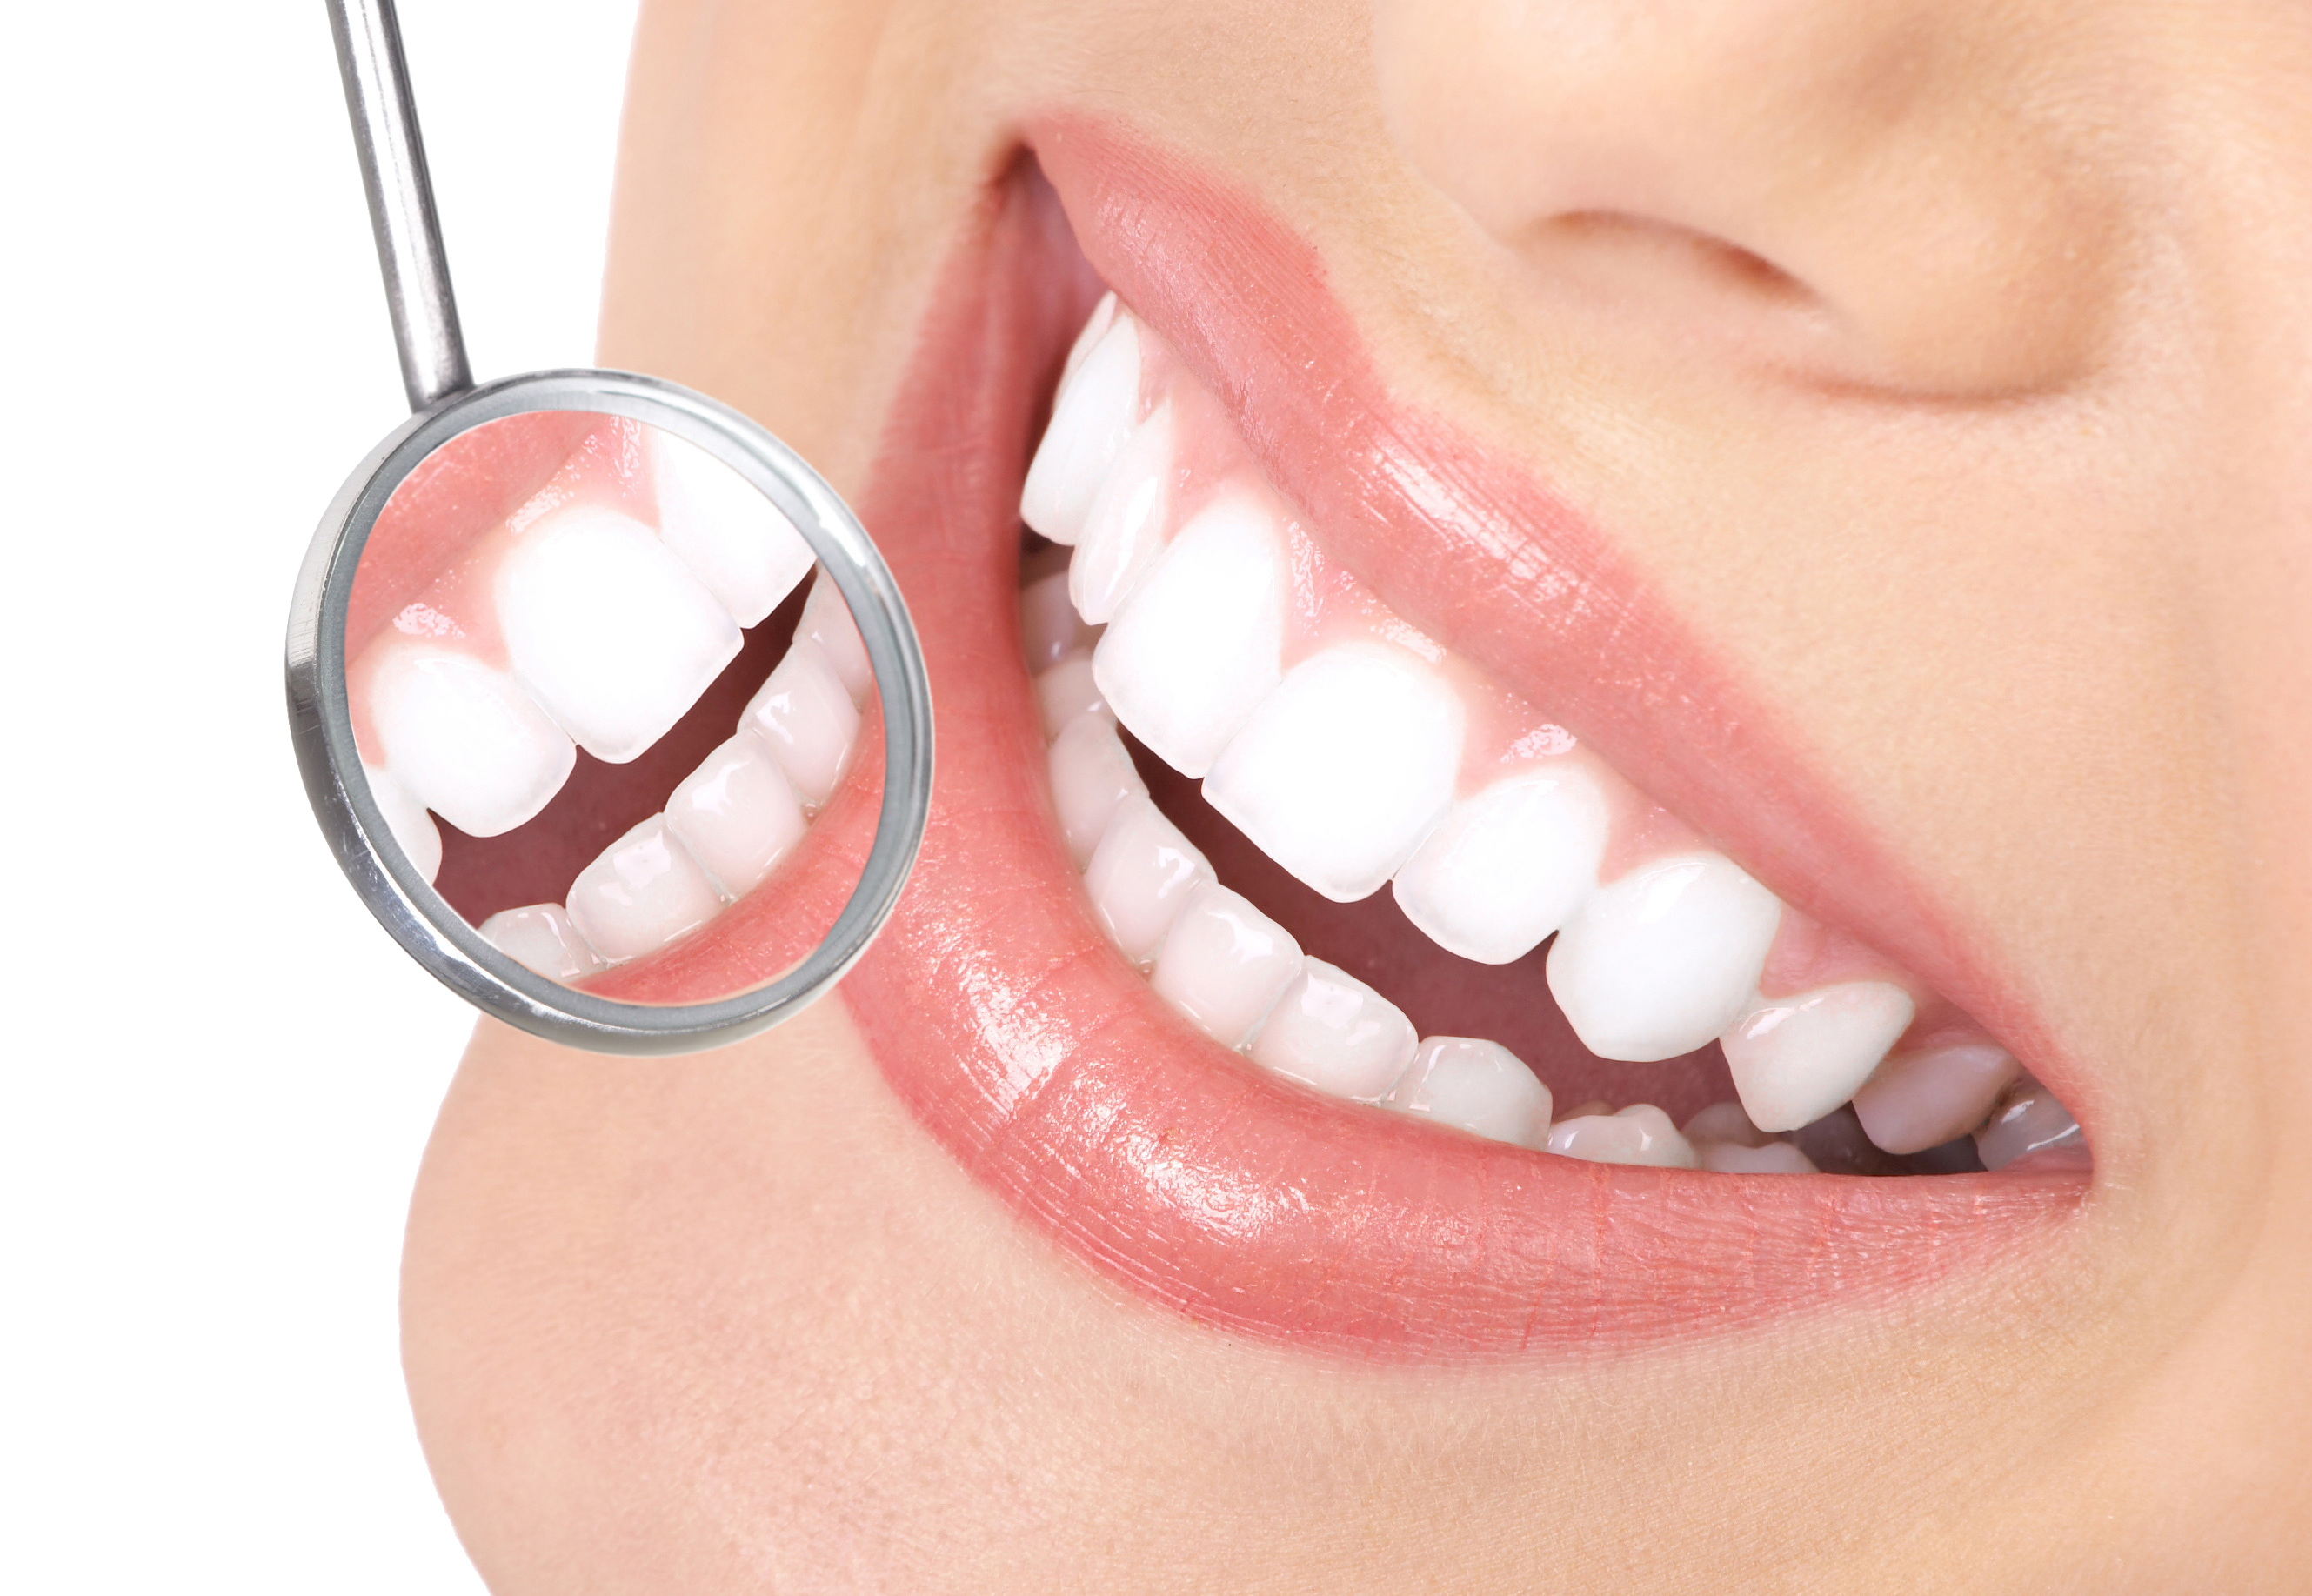 Affordable Dental Plan and Dental Care